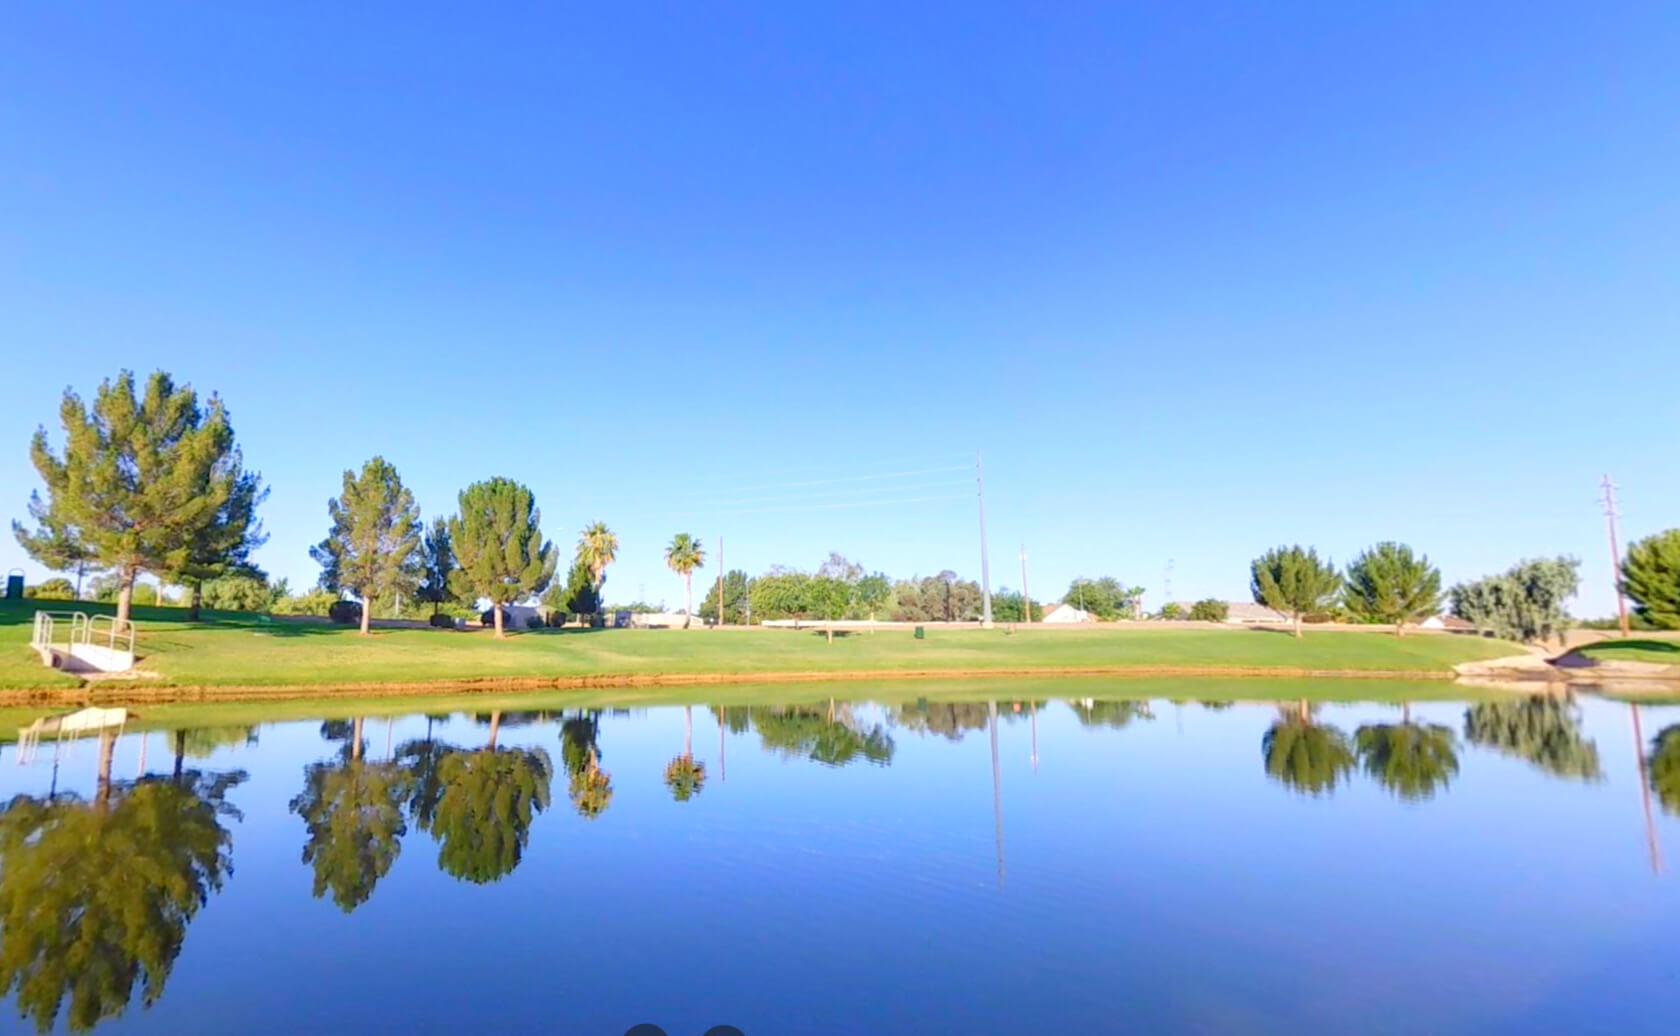 Greenfield-Park-Pond-Lake-Fishing-Guide-Report-Mesa-AZ-02